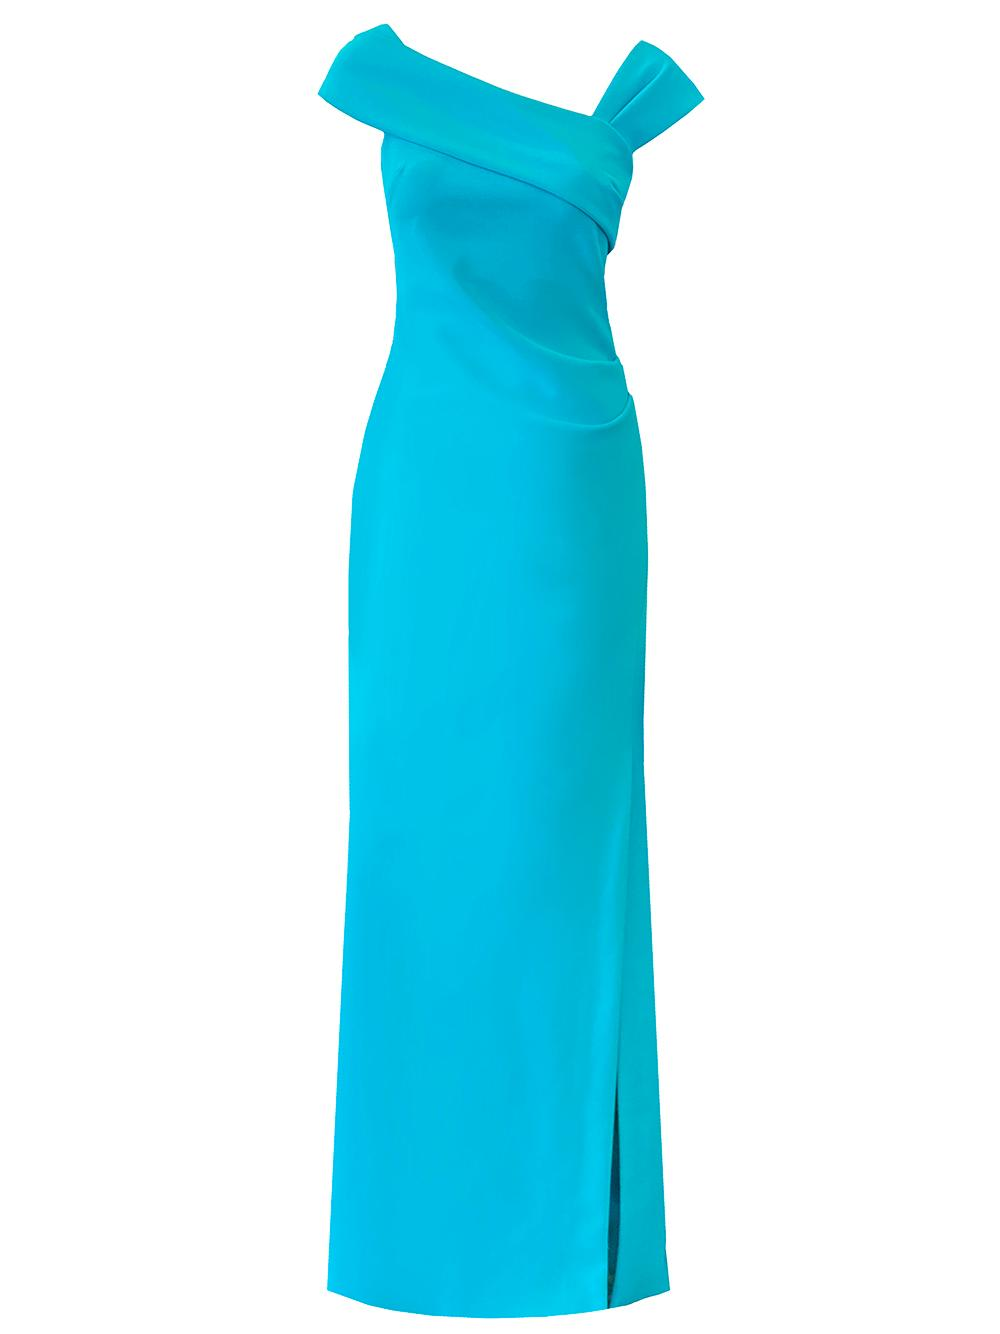 Asymmetrical Neckline Gown